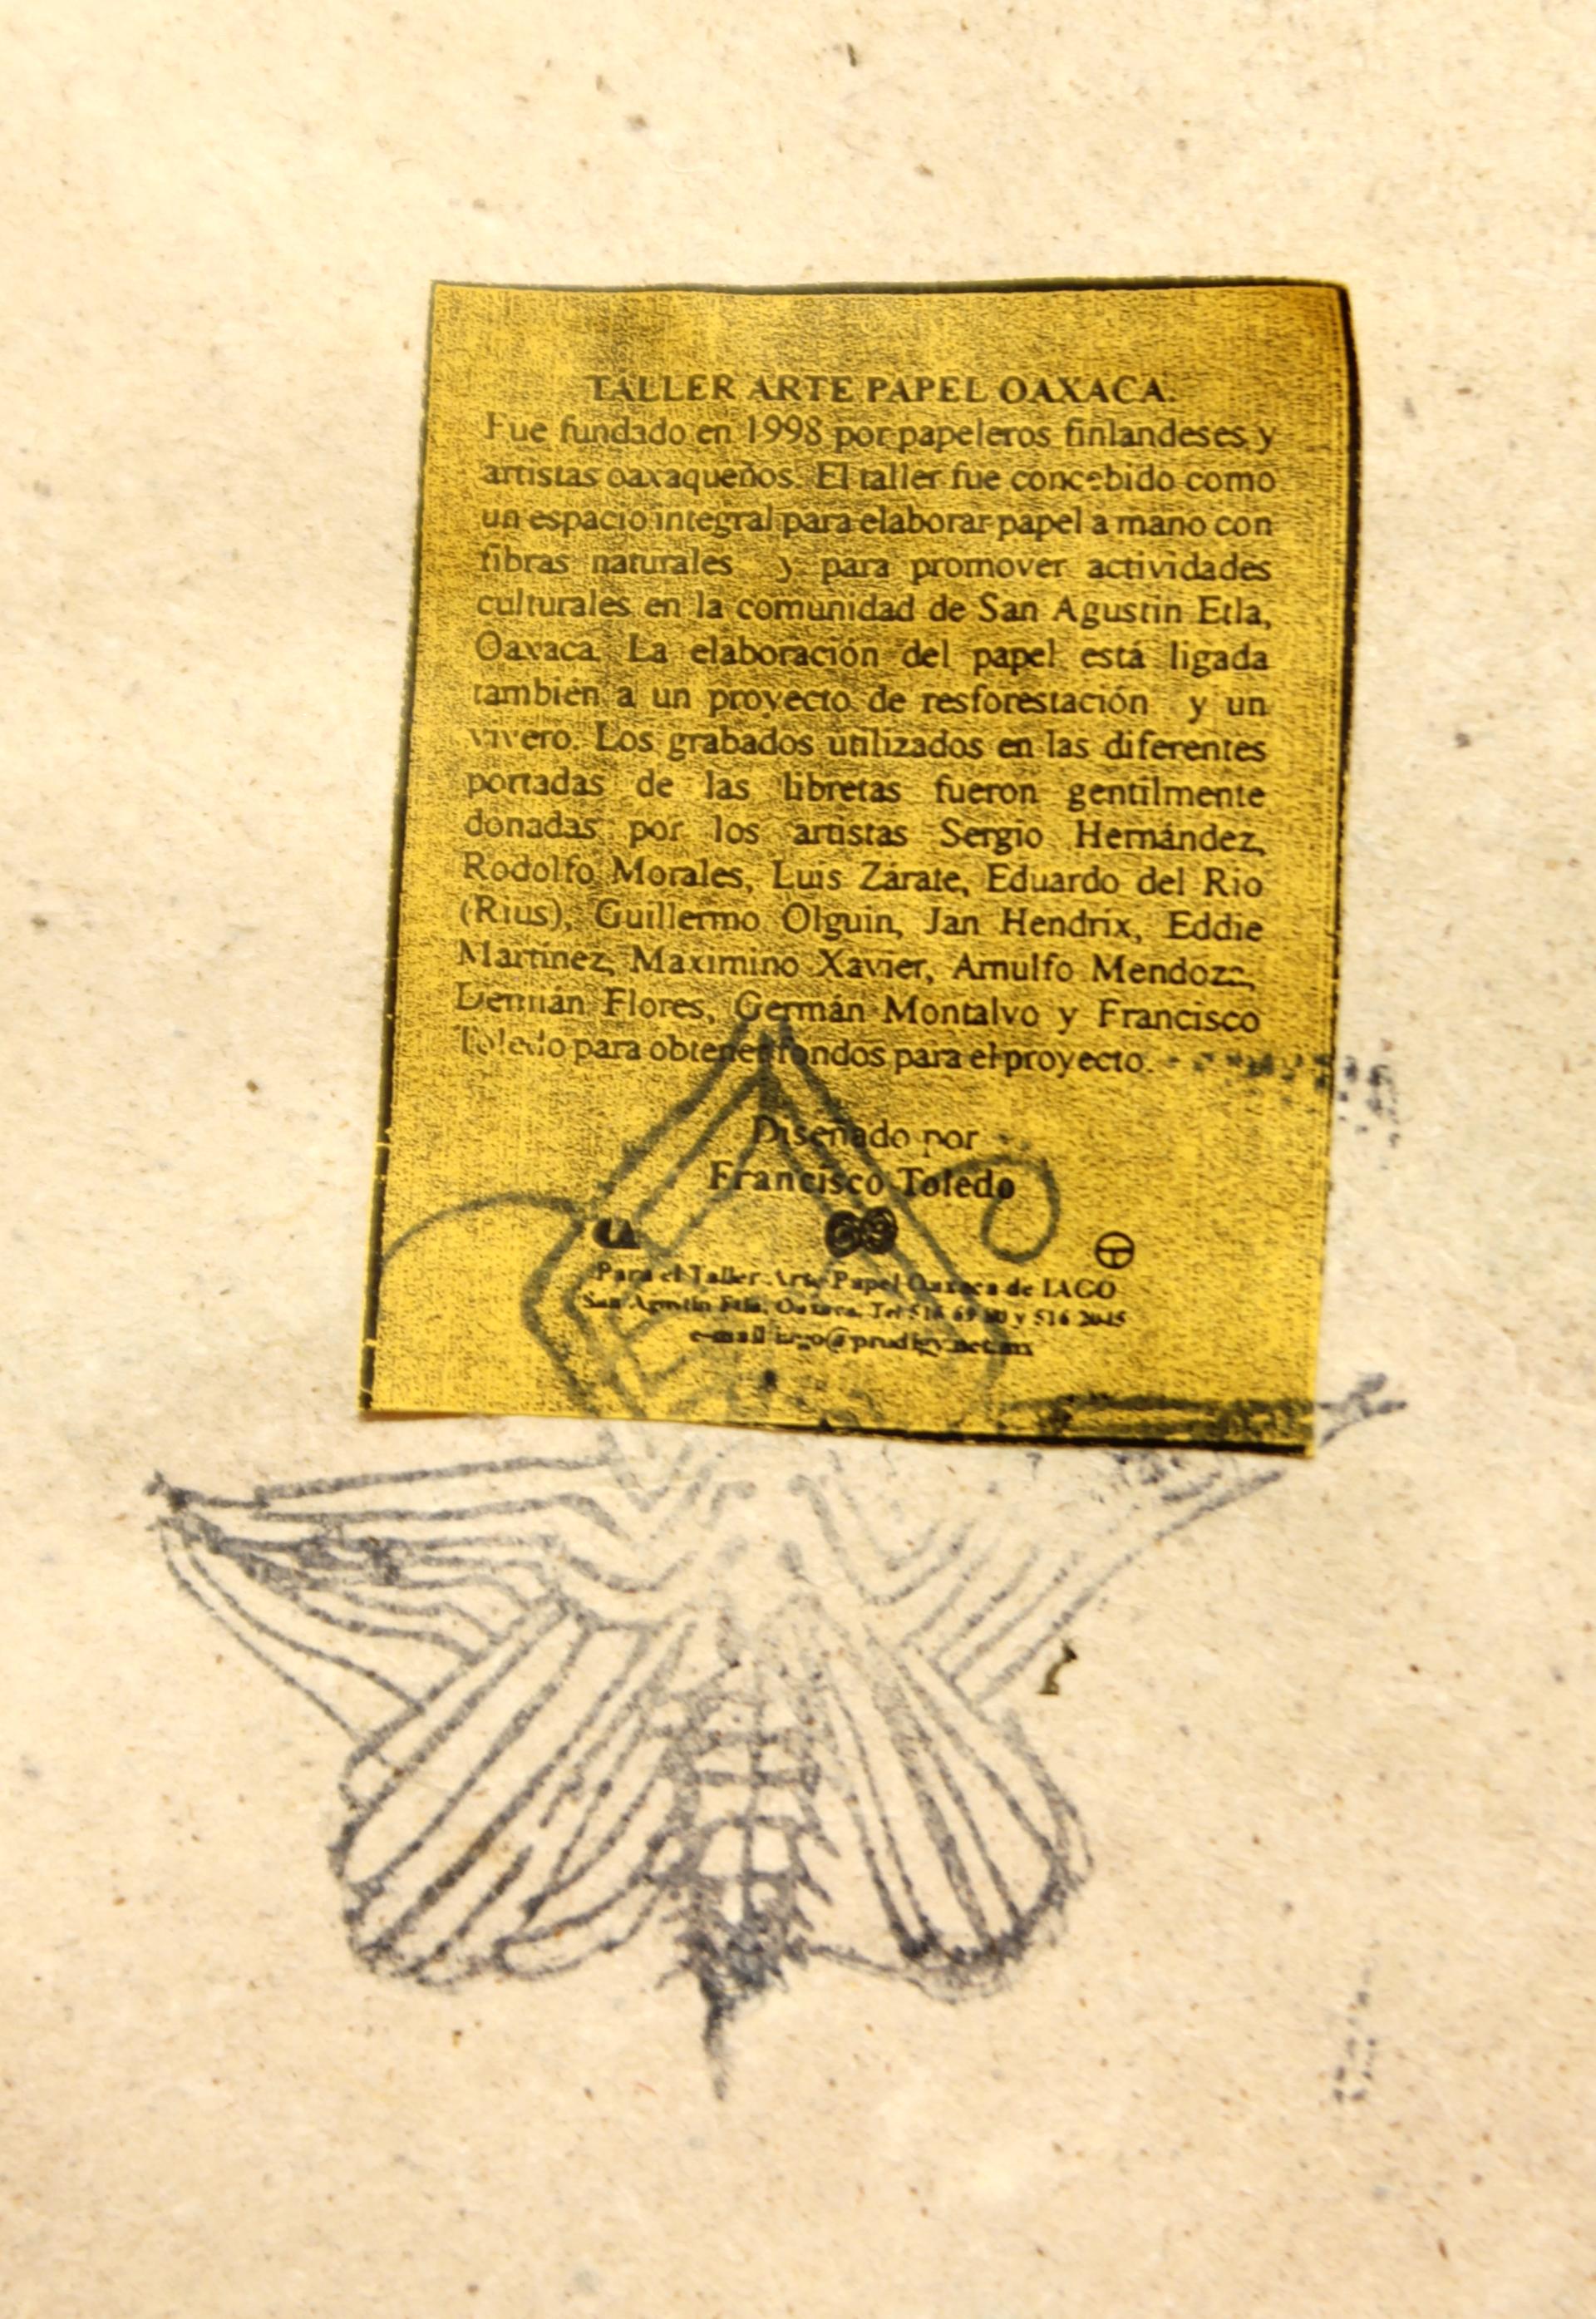 Calaveras Kite by Francisco Toledo (1940 - 2019)